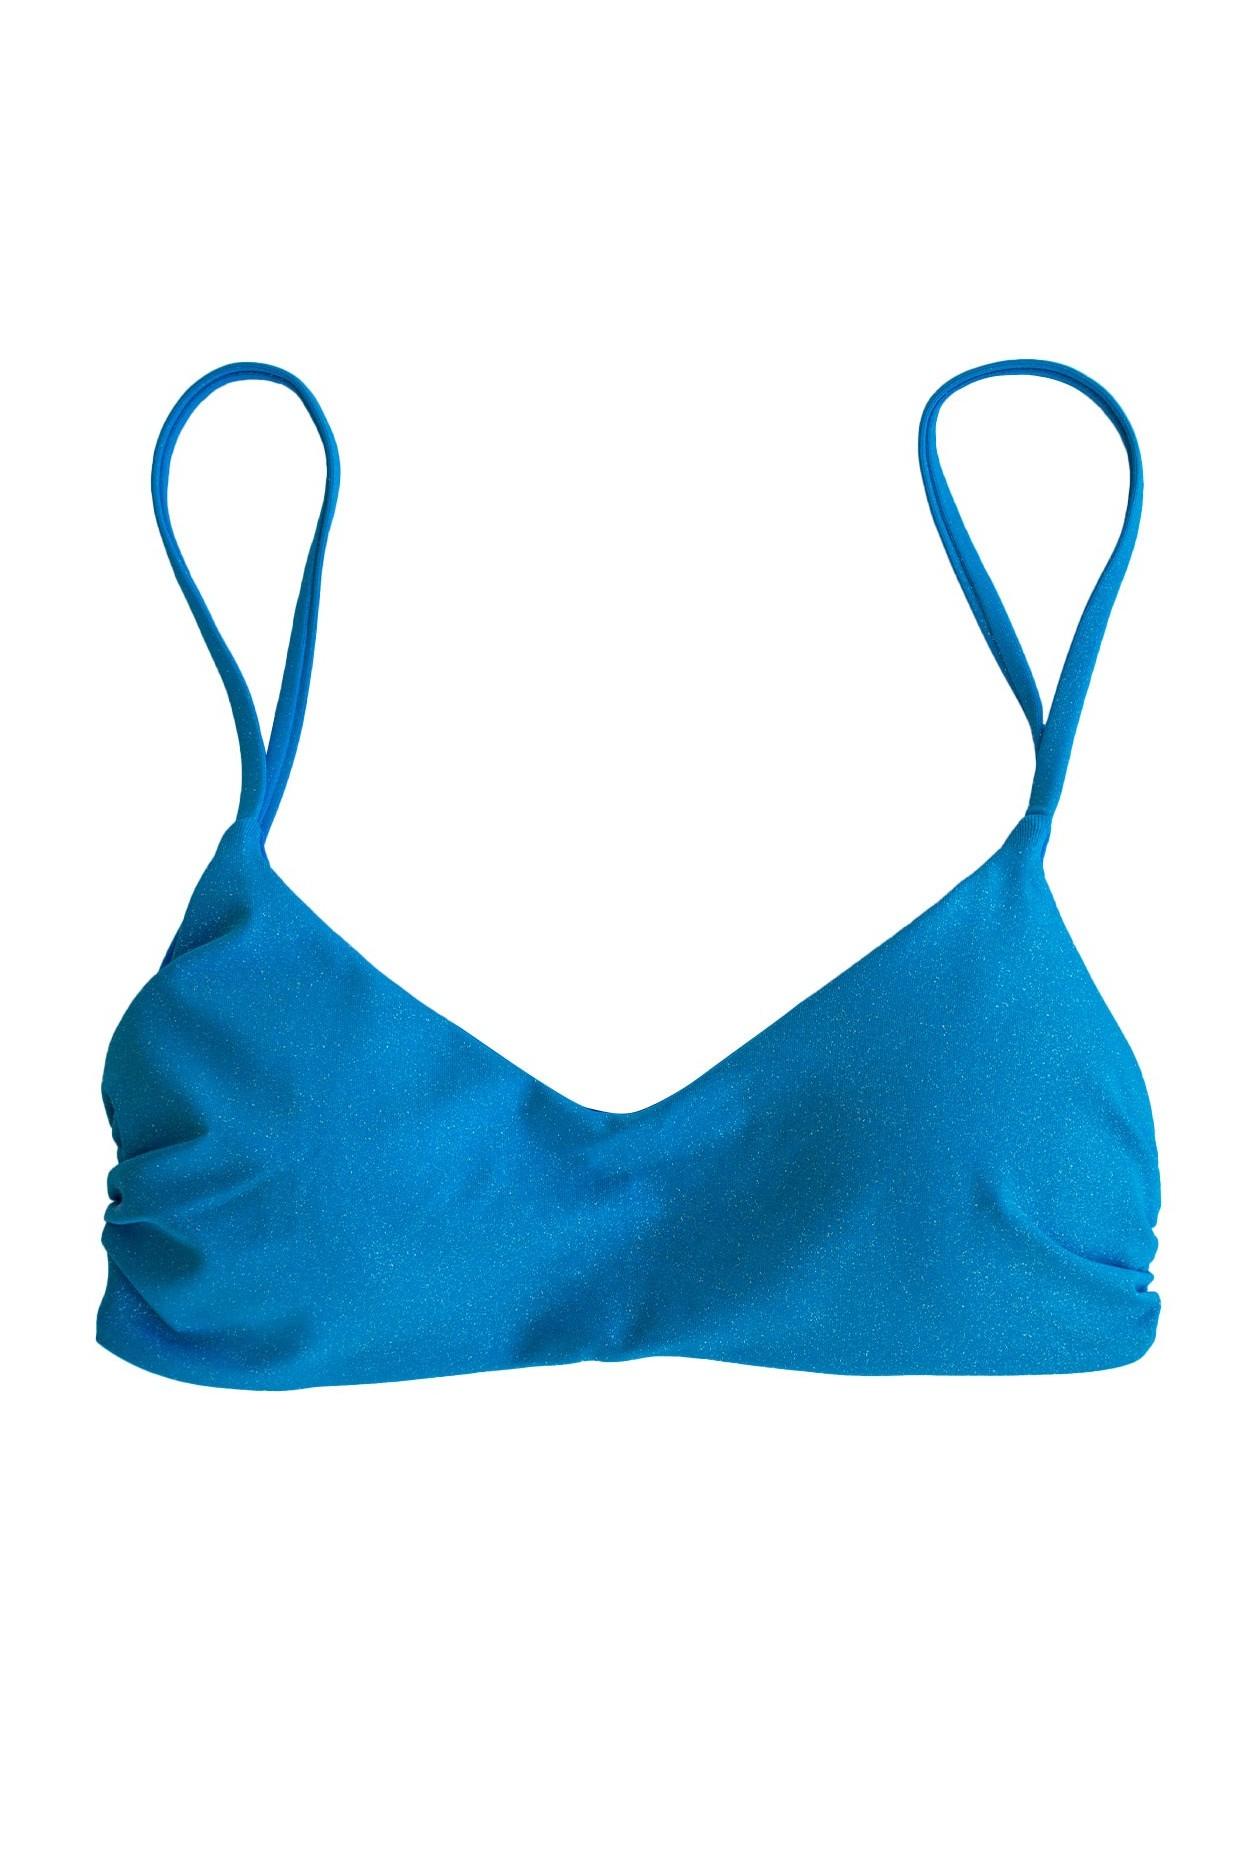 Glam Blu Brassiere